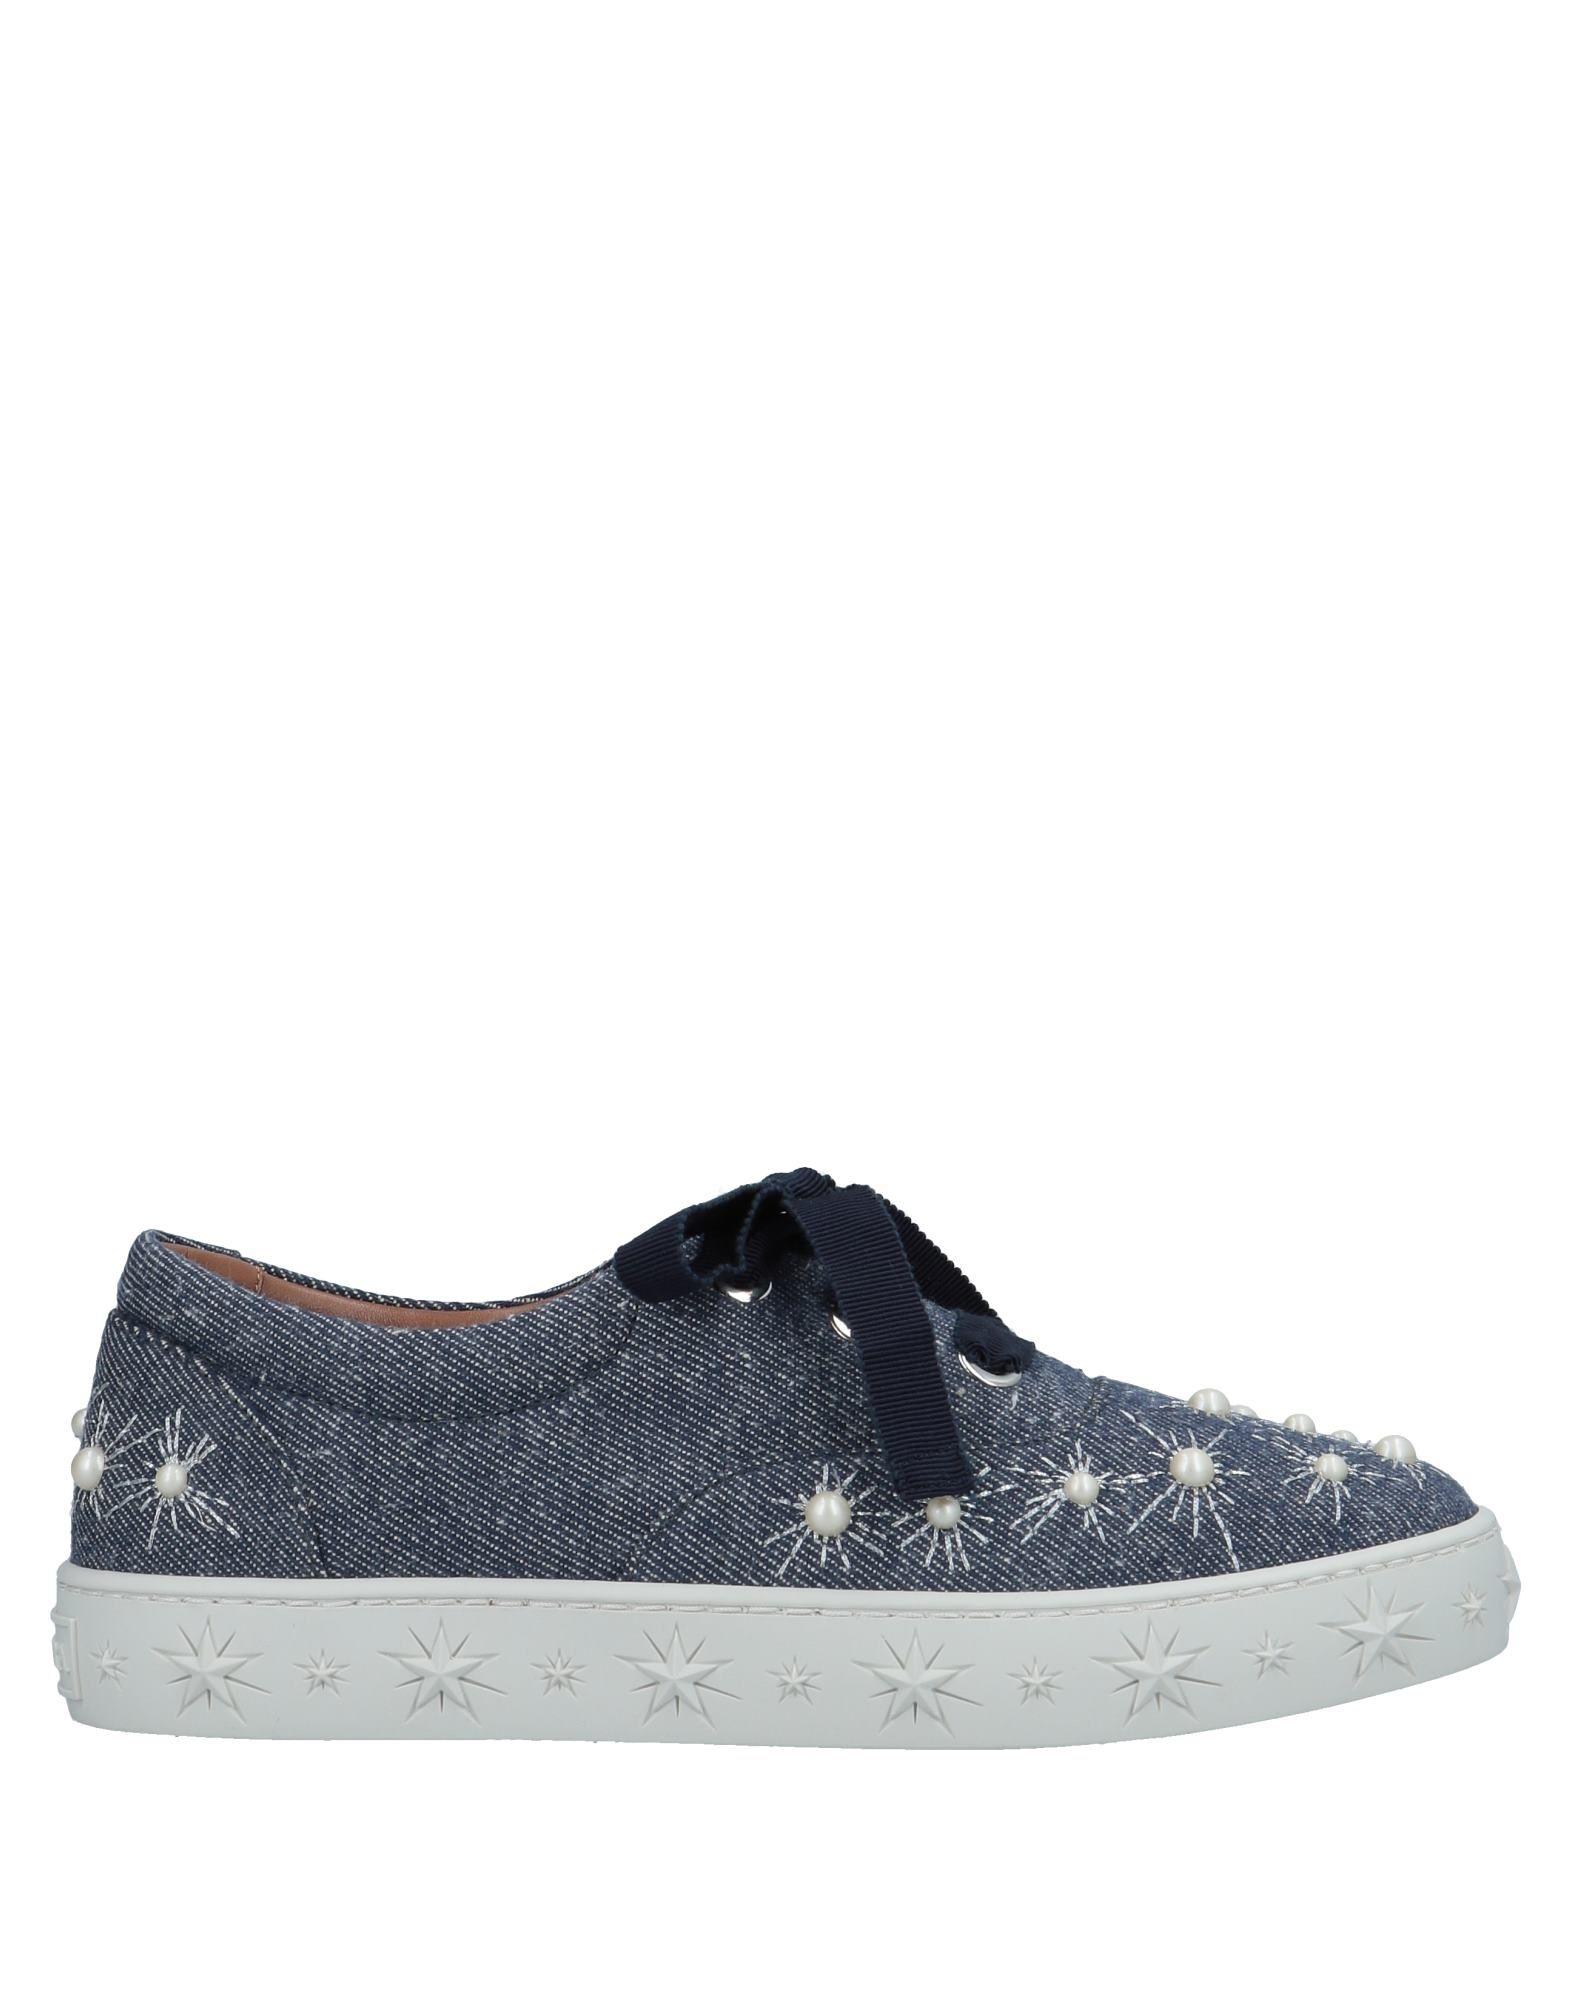 Aquazzura Sneakers In Blue